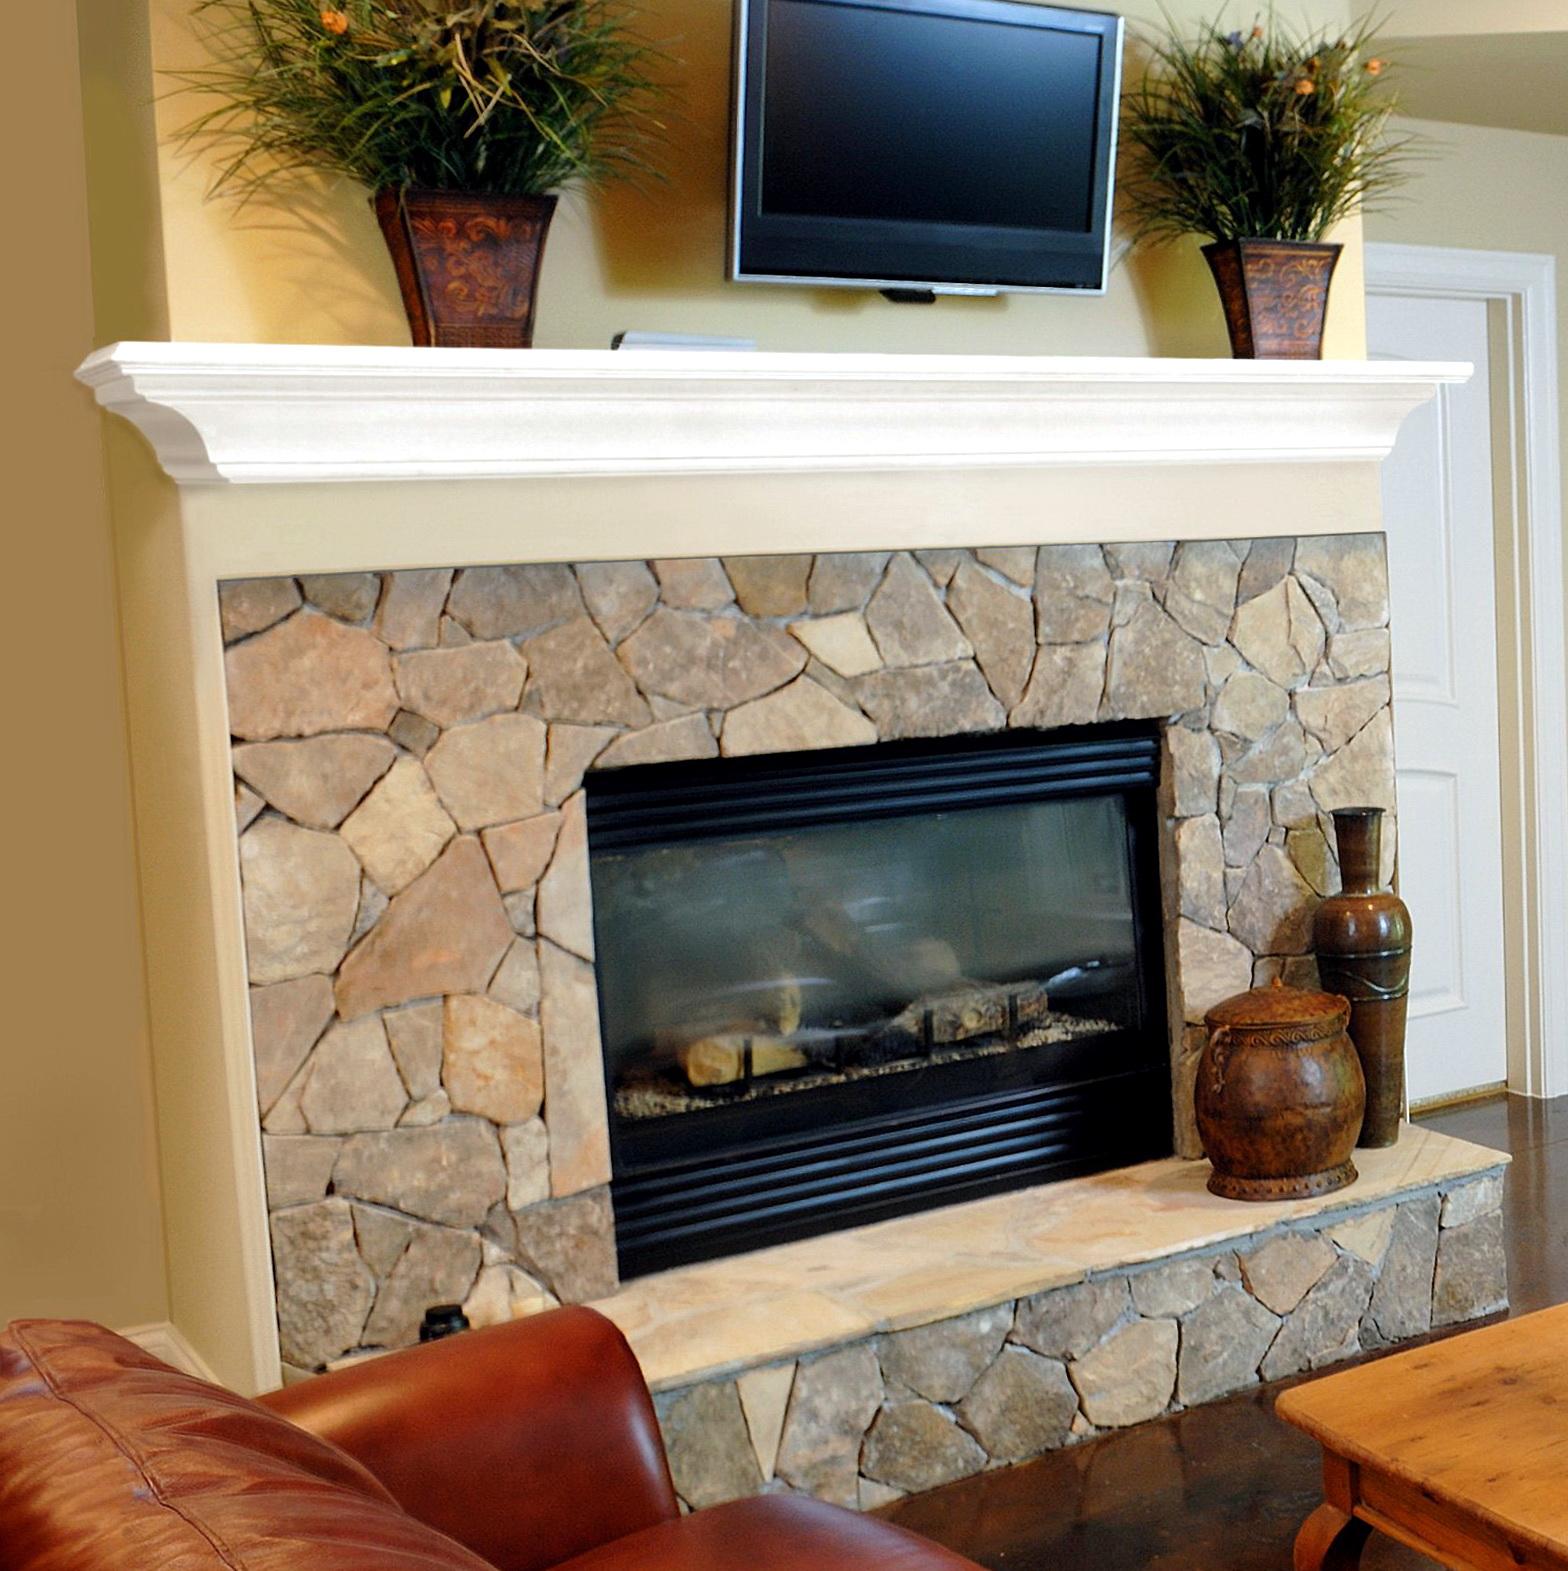 White Fireplace Mantel ShelvesWhite Fireplace Mantel Shelves   Home Design Ideas. White Fireplace Mantel Shelf. Home Design Ideas